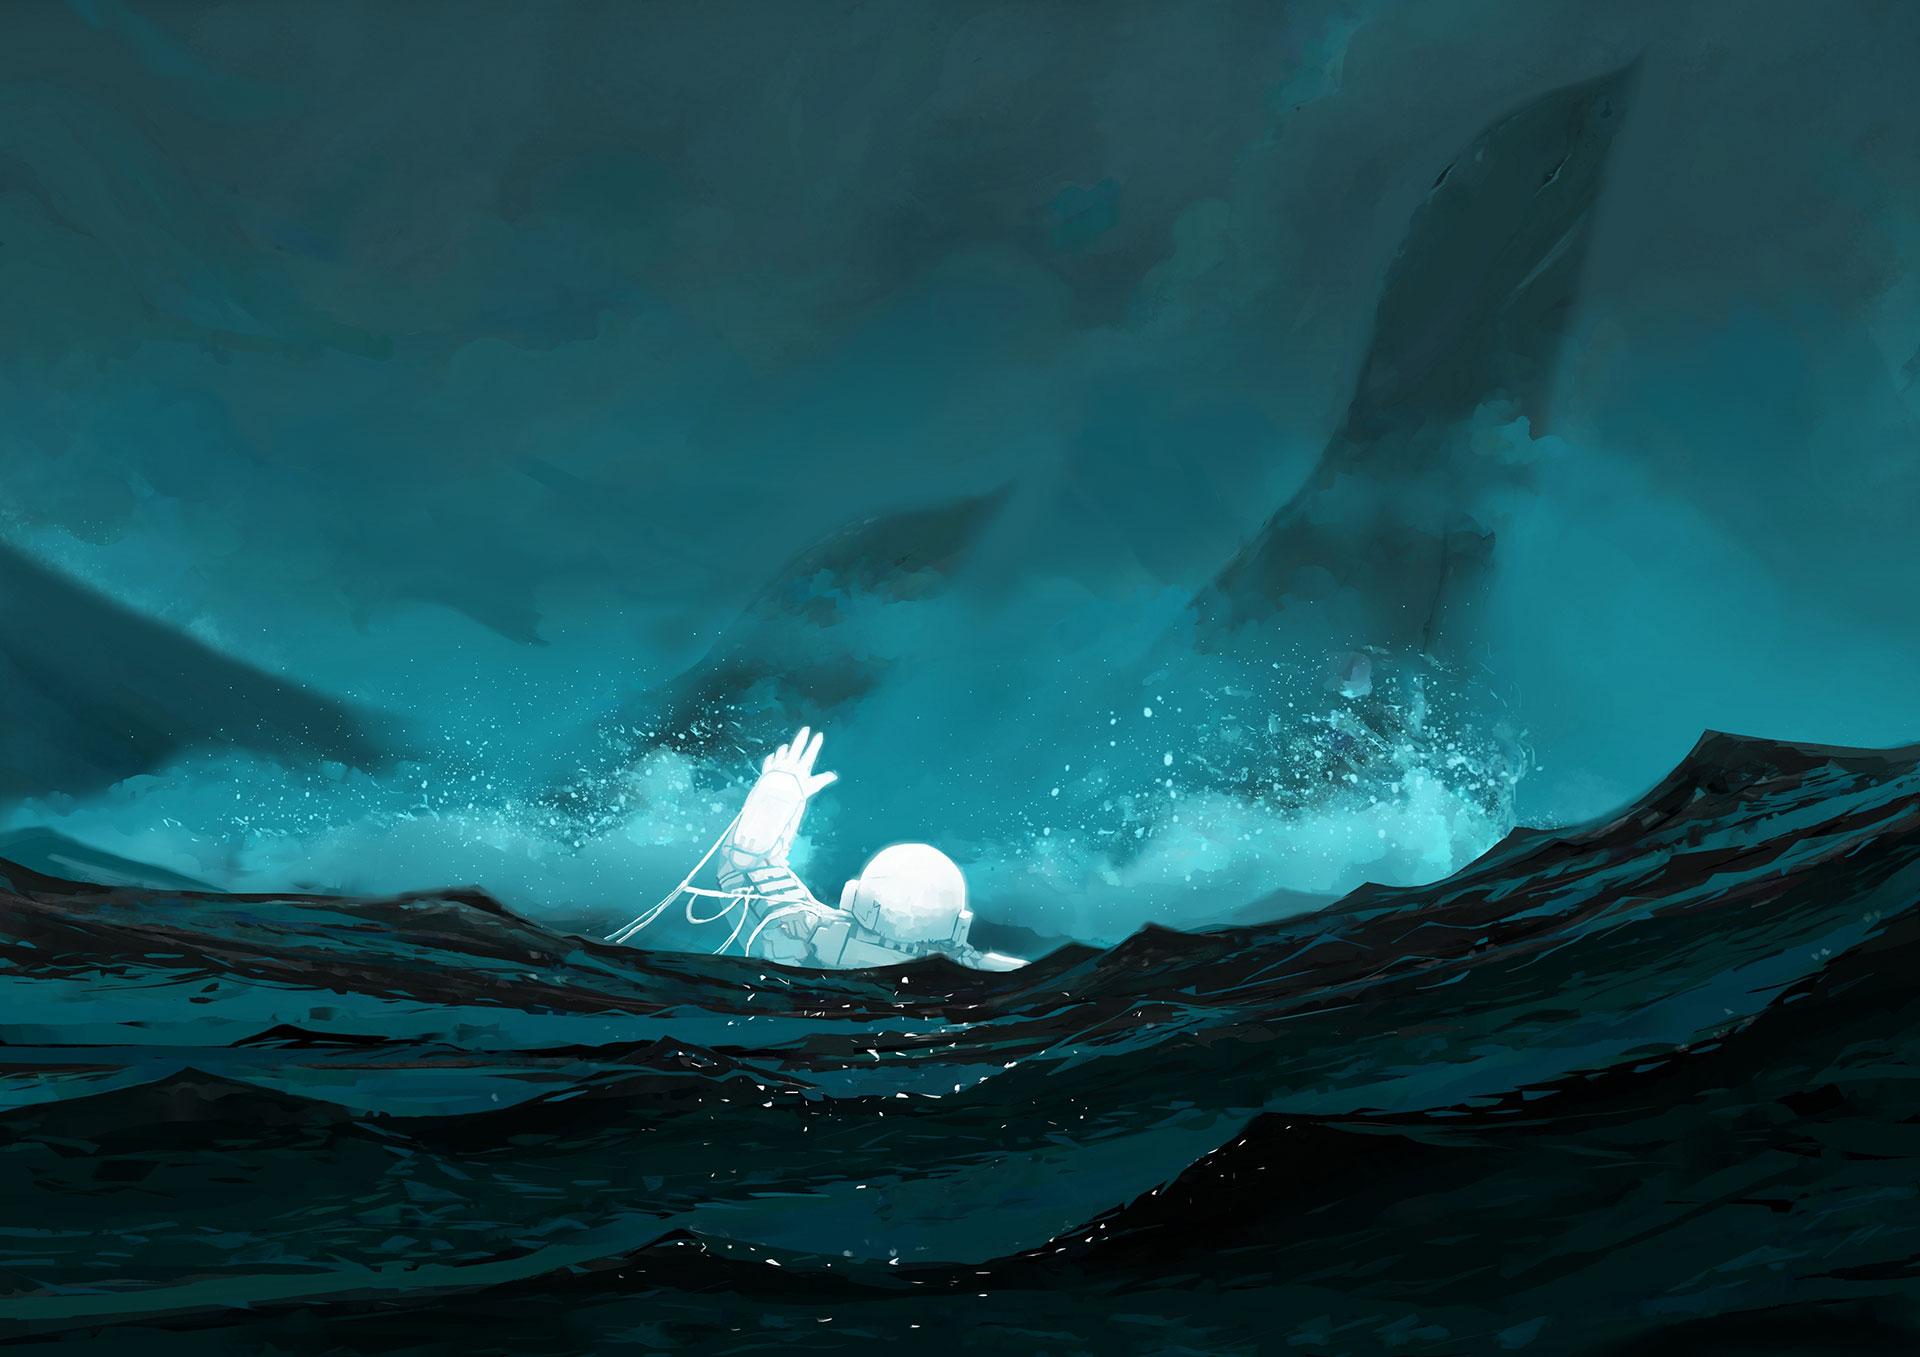 Crash in a Hostile Sea